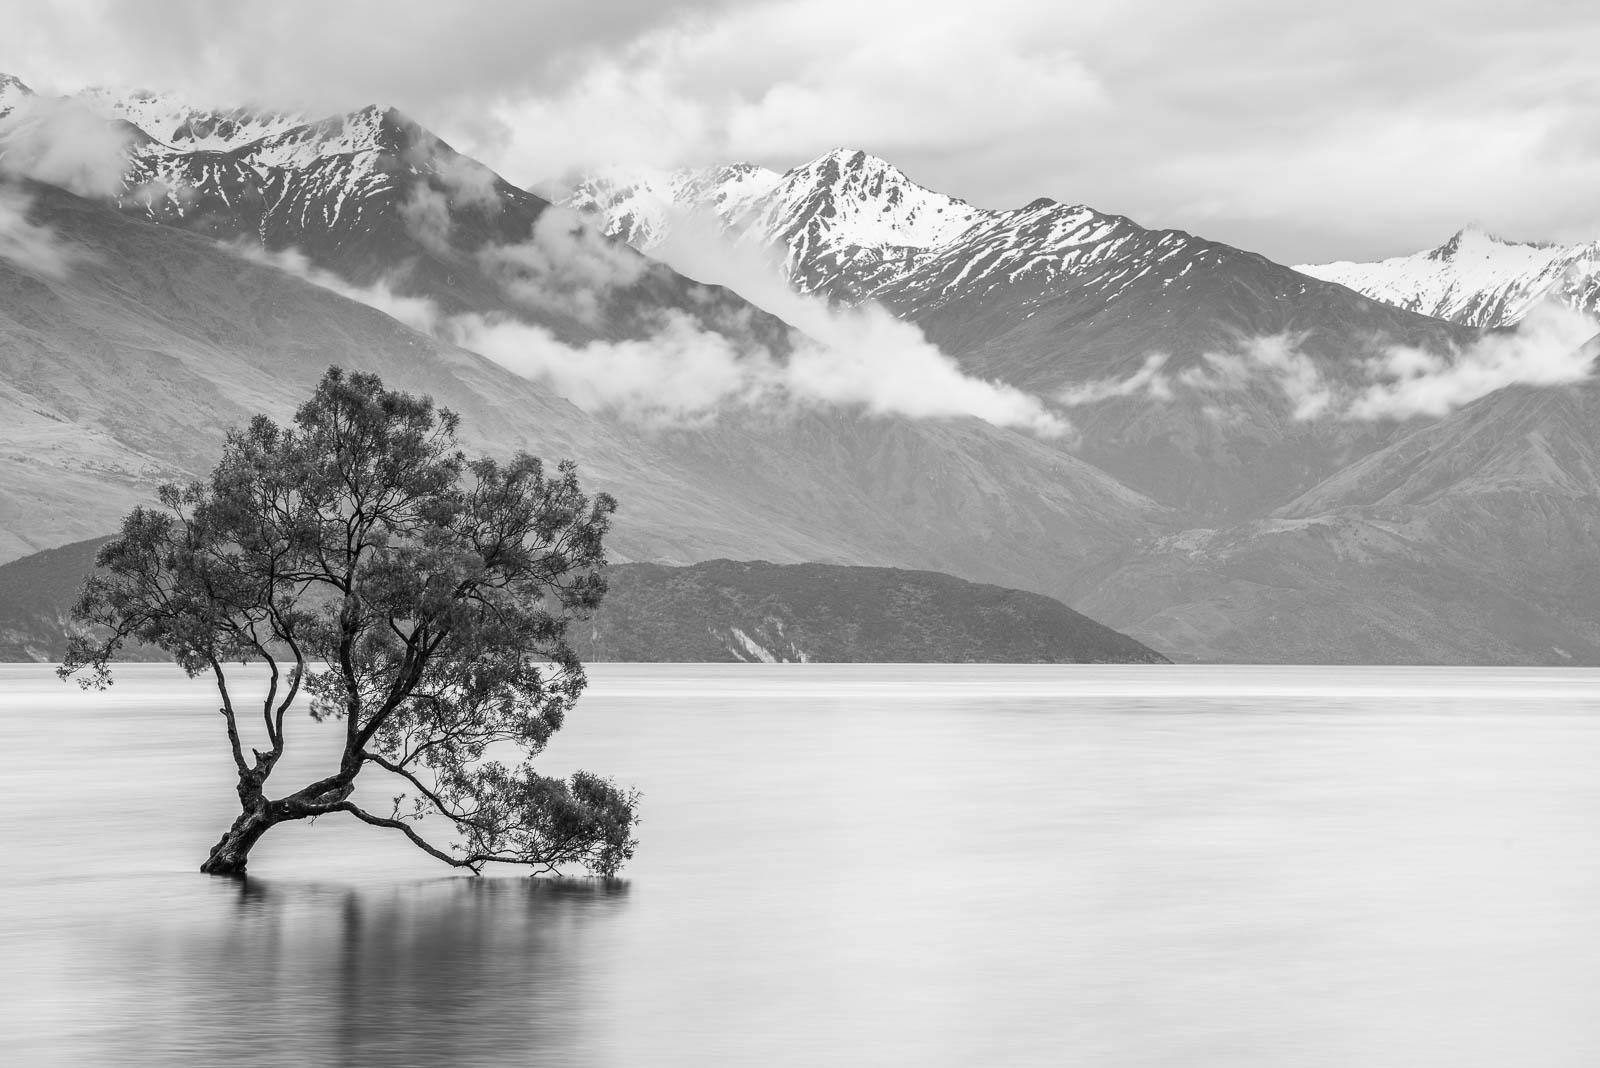 Lake Wanaka The Wanaka Tree That